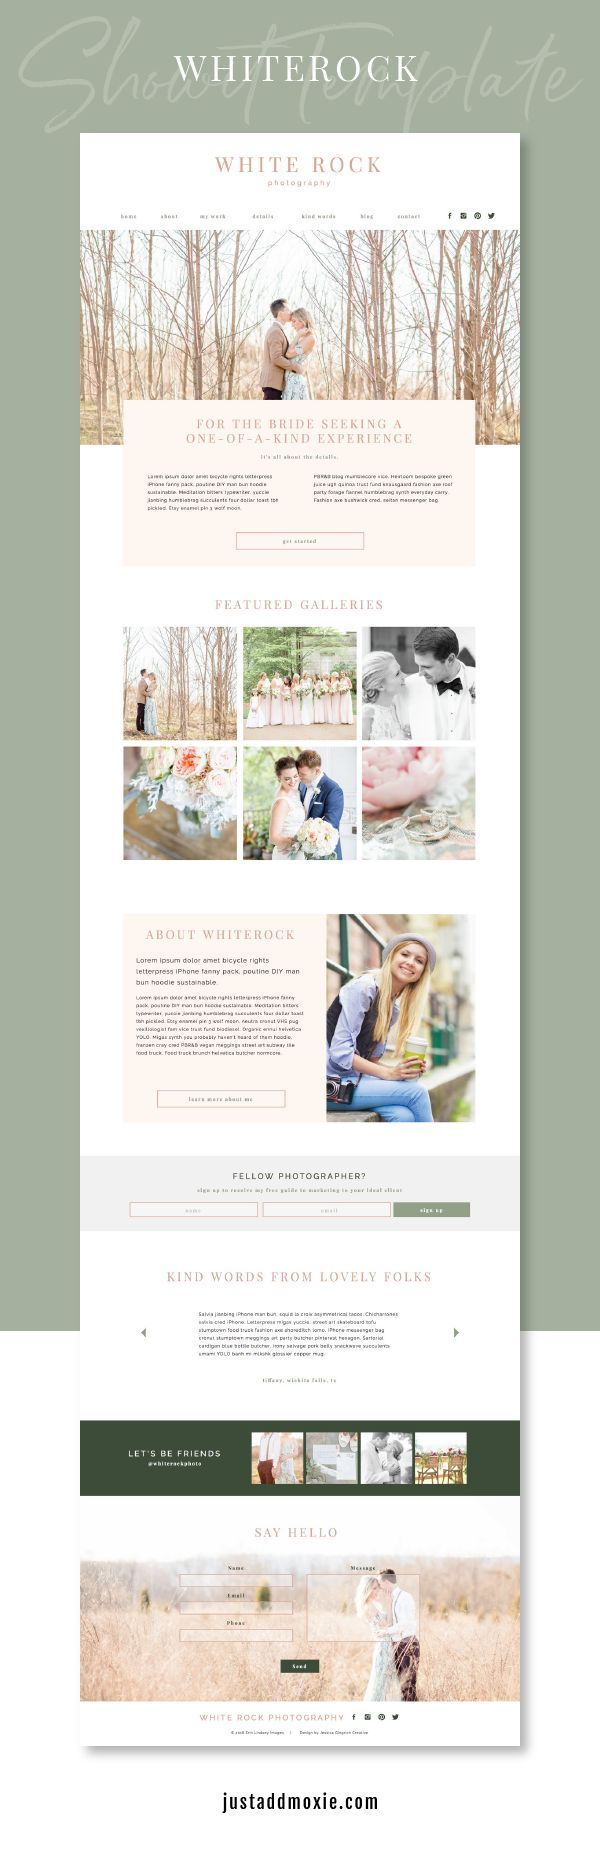 White Rock Showit Template Showit Website Design Inspiration Branding Website Design